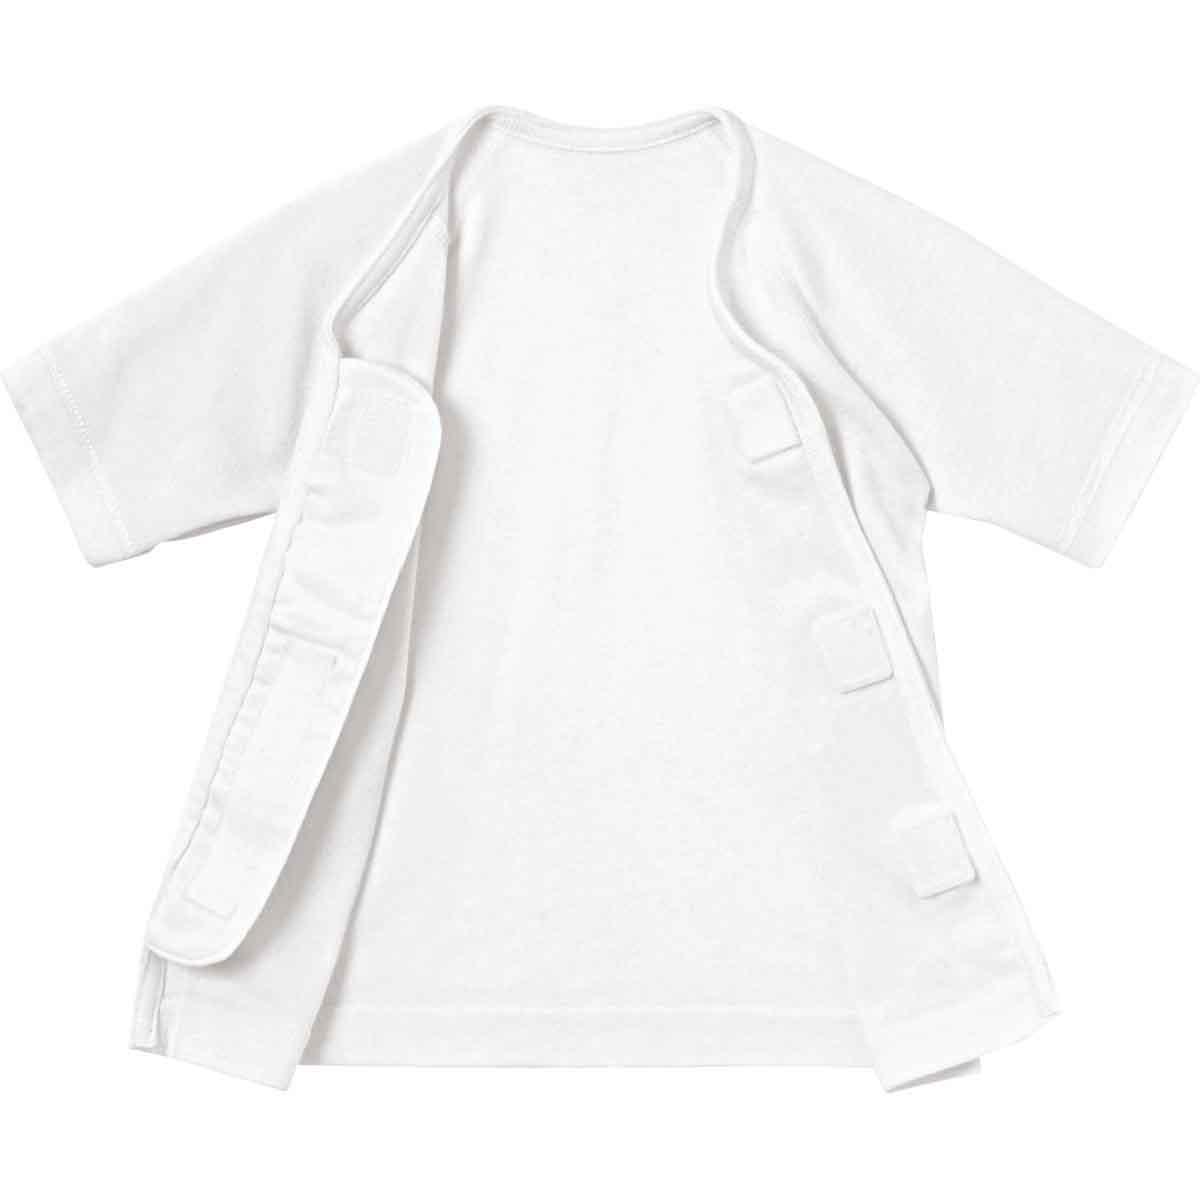 672bce749c82e 楽天市場  43%OFF ベビーワンタッチ肌着2枚組ギフト ベビー服 子供服 ...